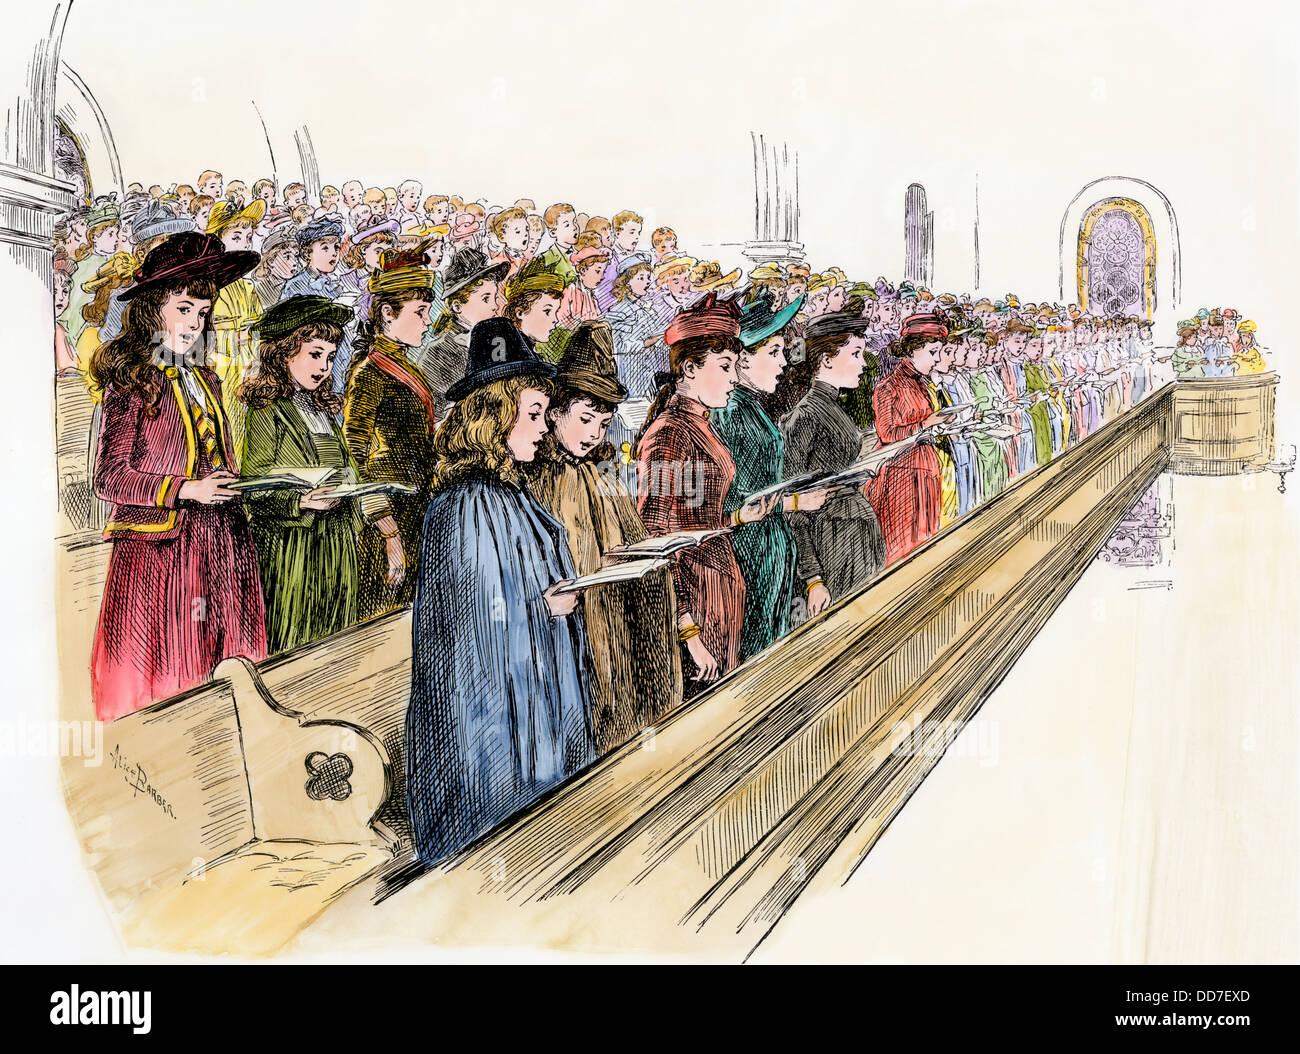 History Of Philadelphia Stockfotos & History Of Philadelphia Bilder ...